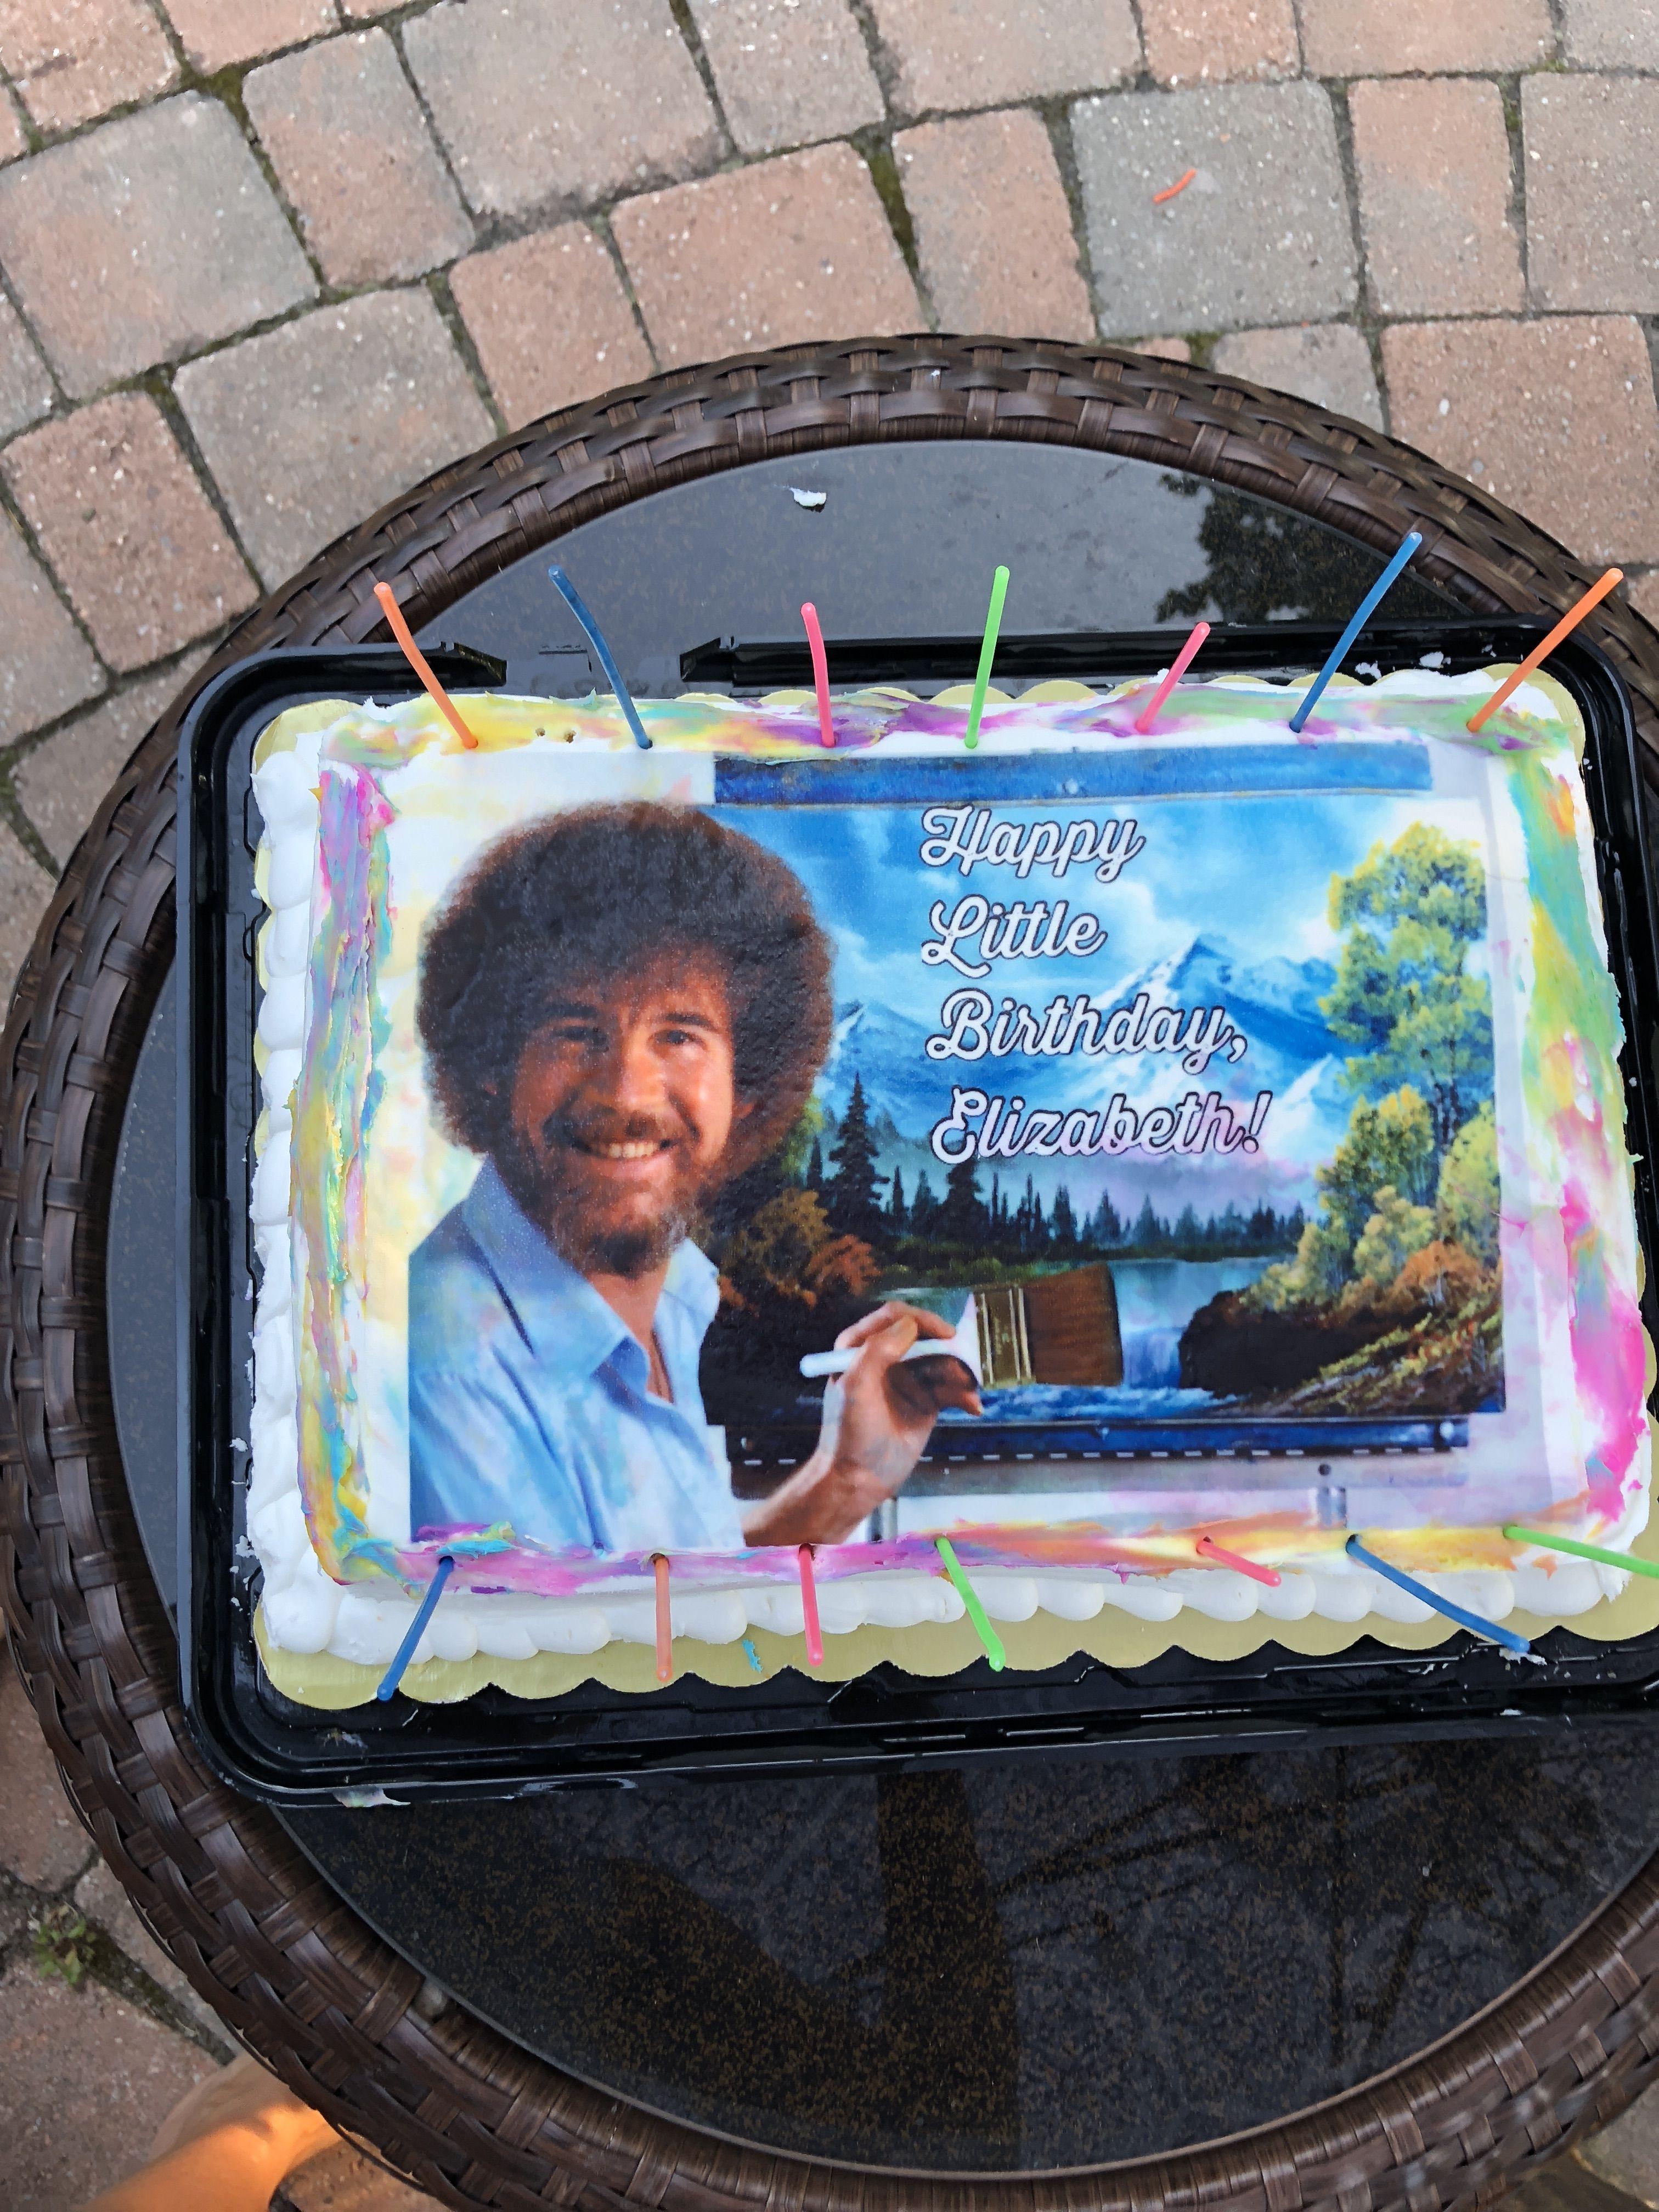 Daughter's birthday cake Bob ross birthday, Bob ross